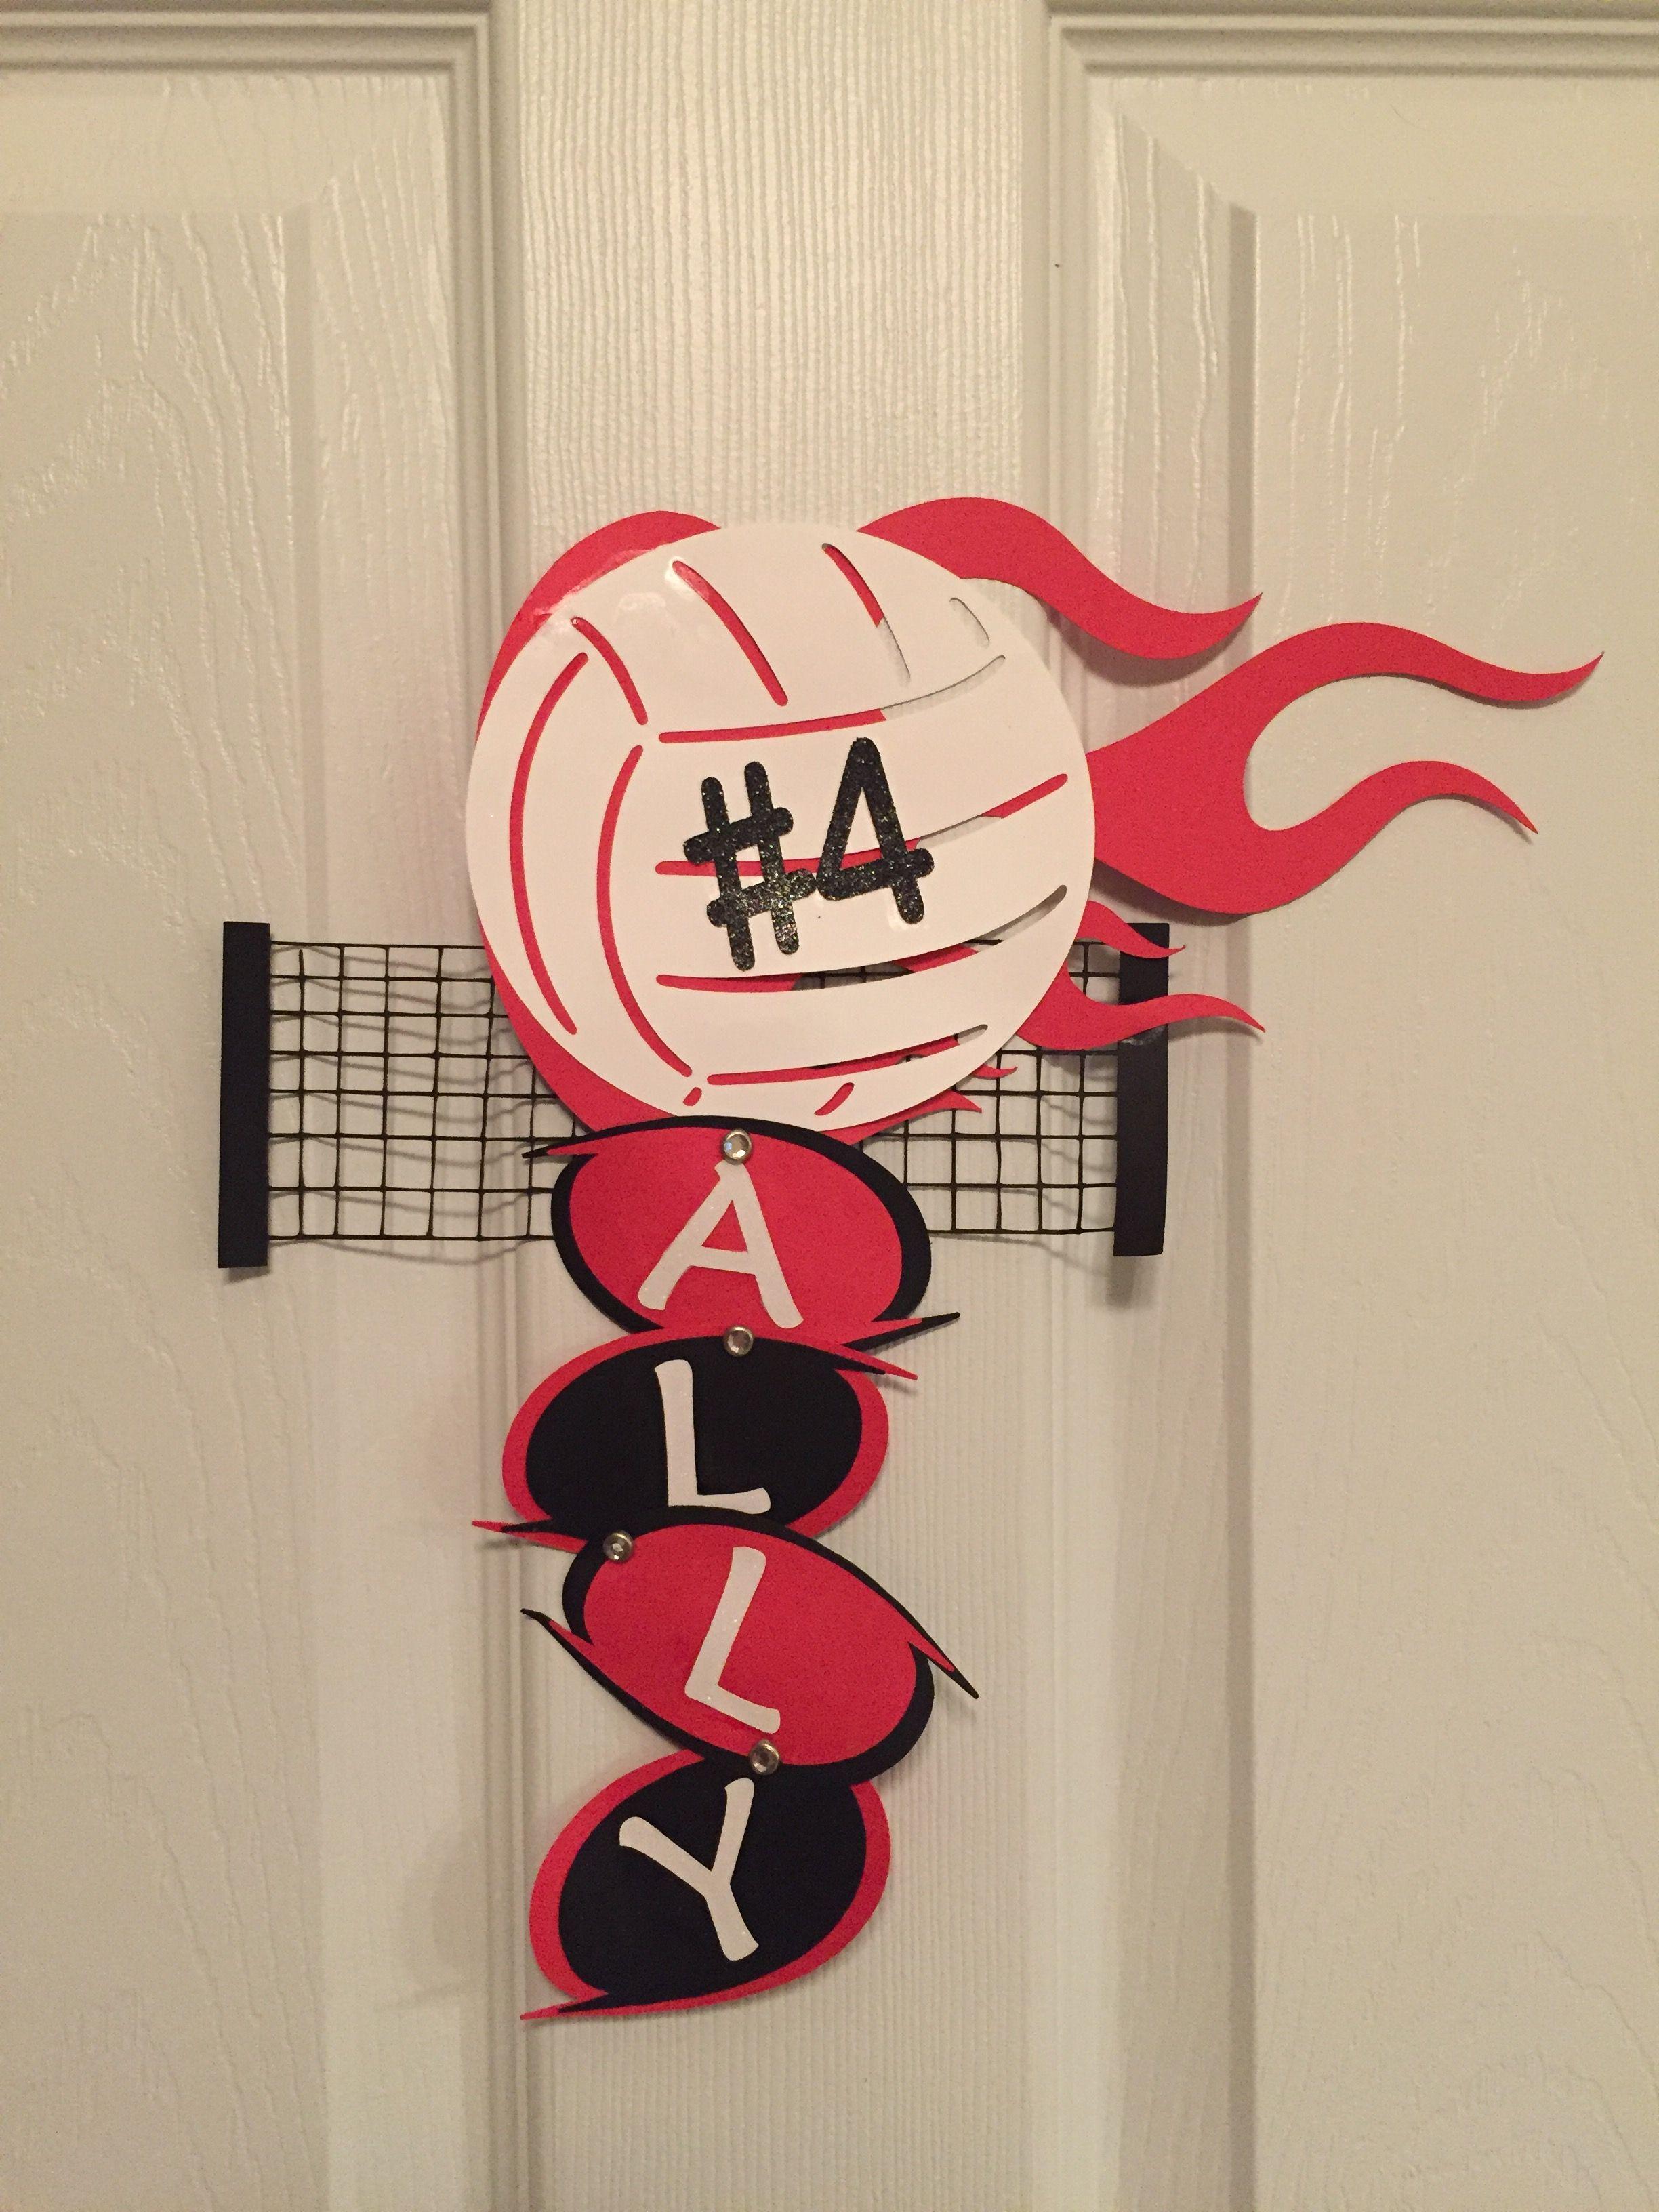 Volleyball Door Signs Volleyball Locker Decorations Volleyball Crafts Volleyball Locker